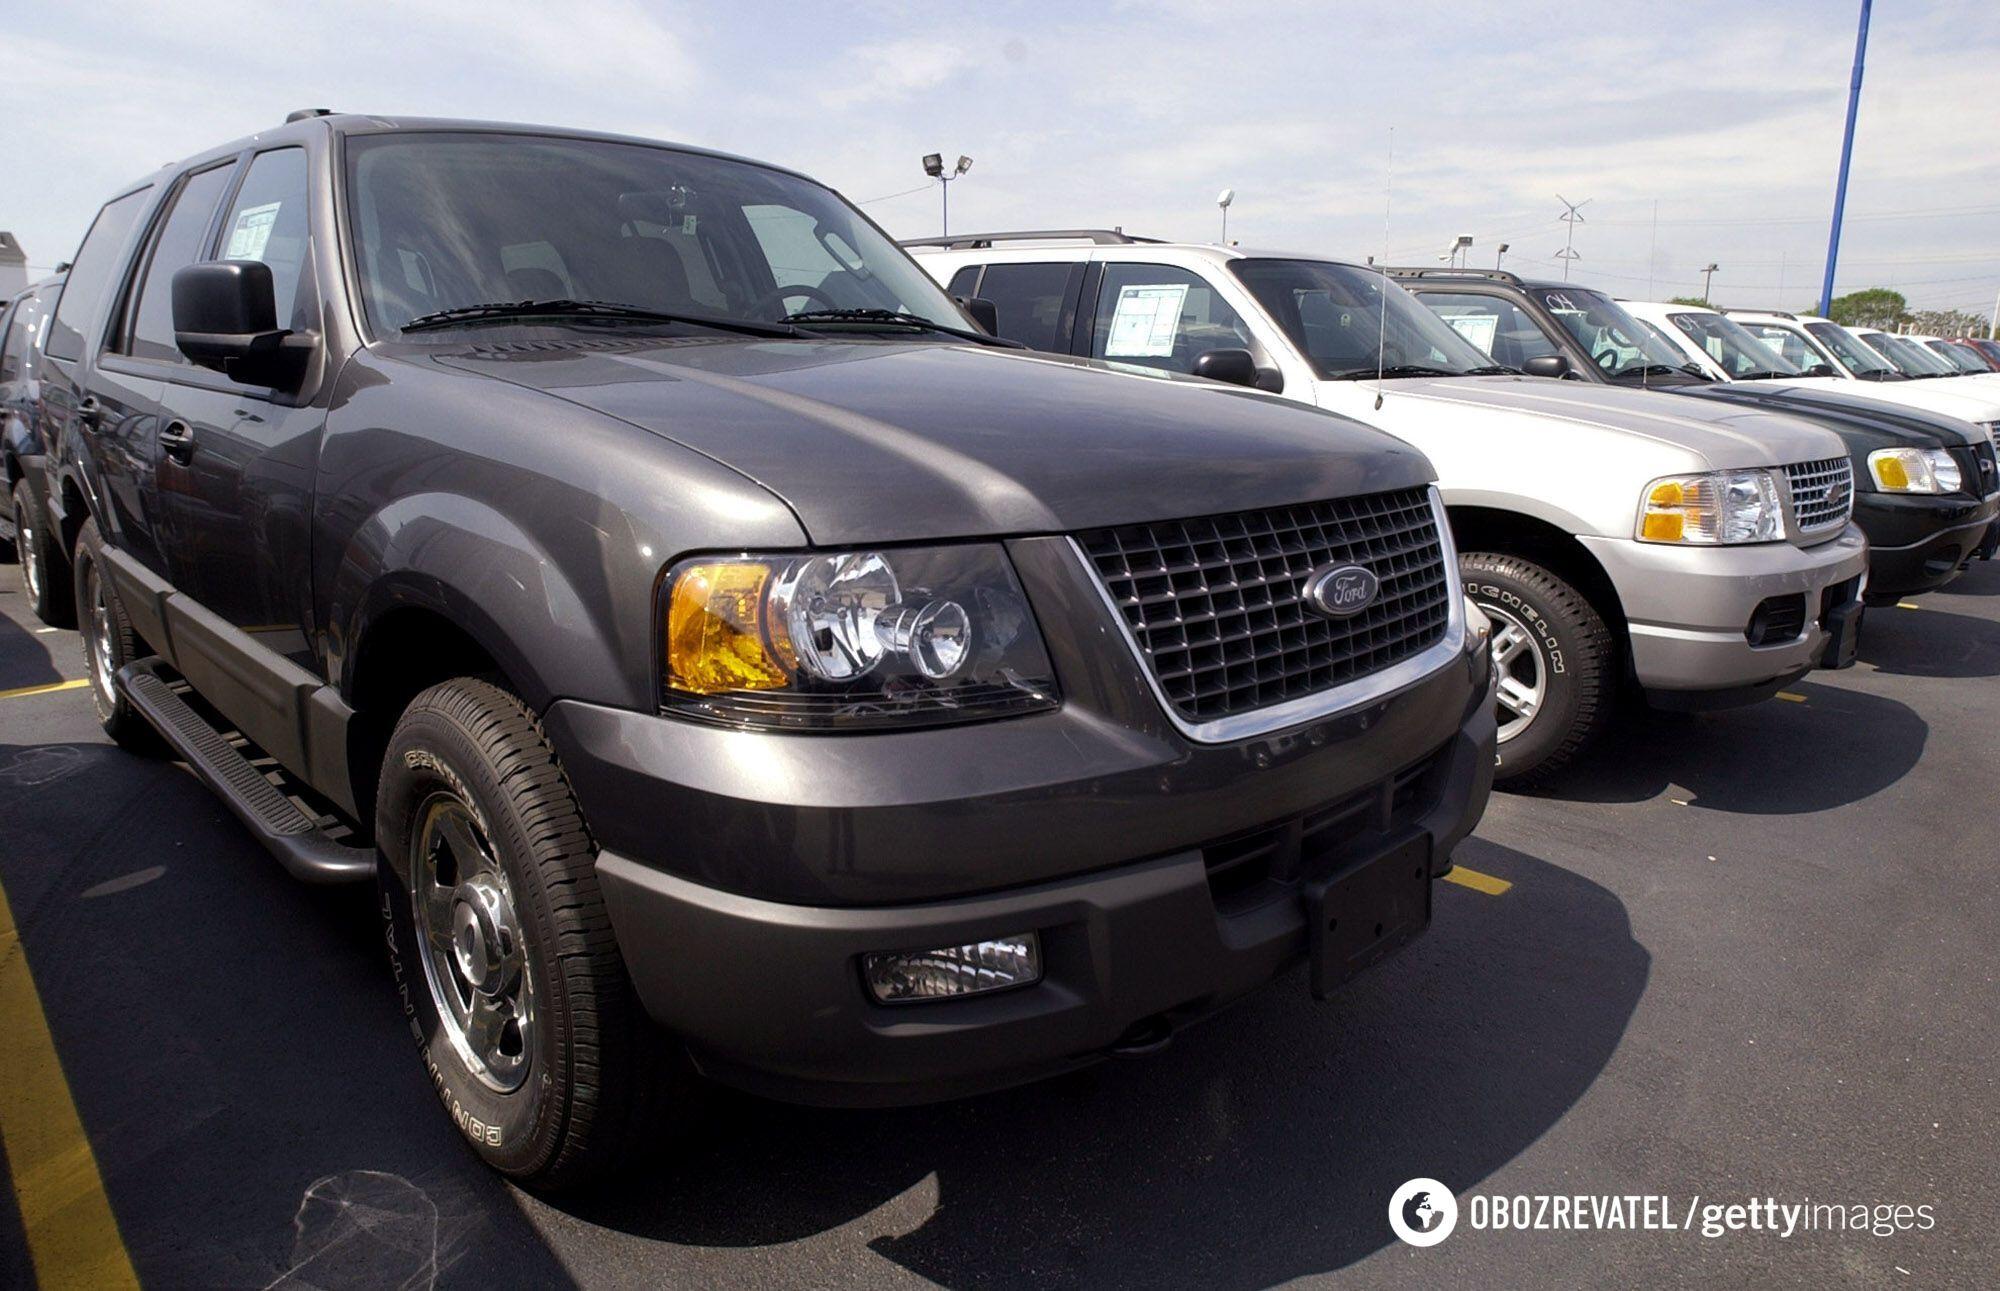 Ford Explorer 2004 року випуску